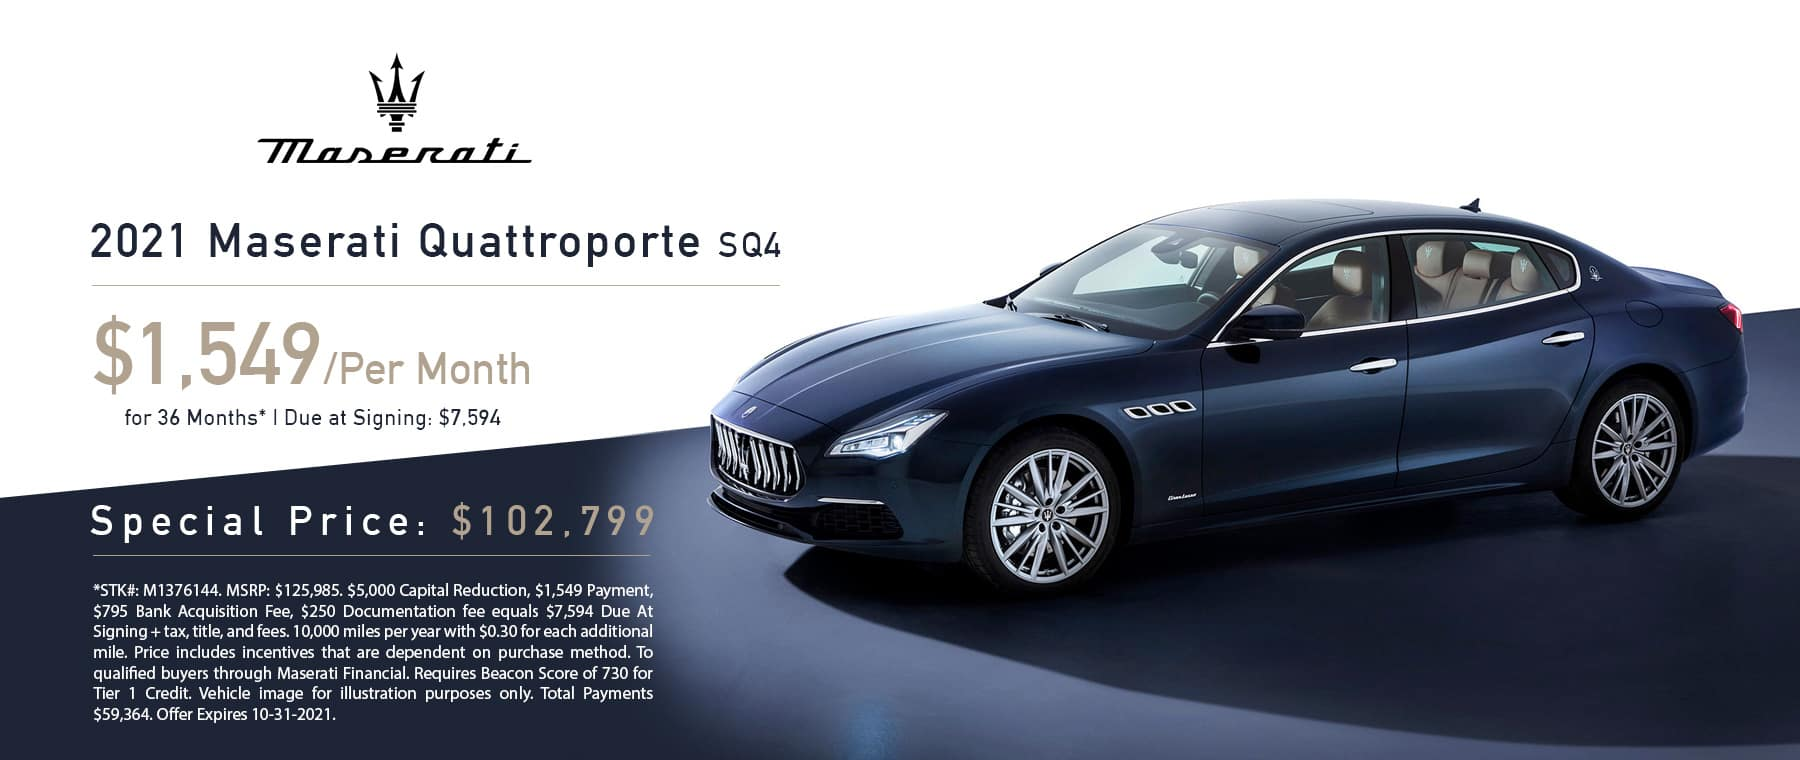 Maserati_2021_Quattroporte_Slide_Oct2021_1